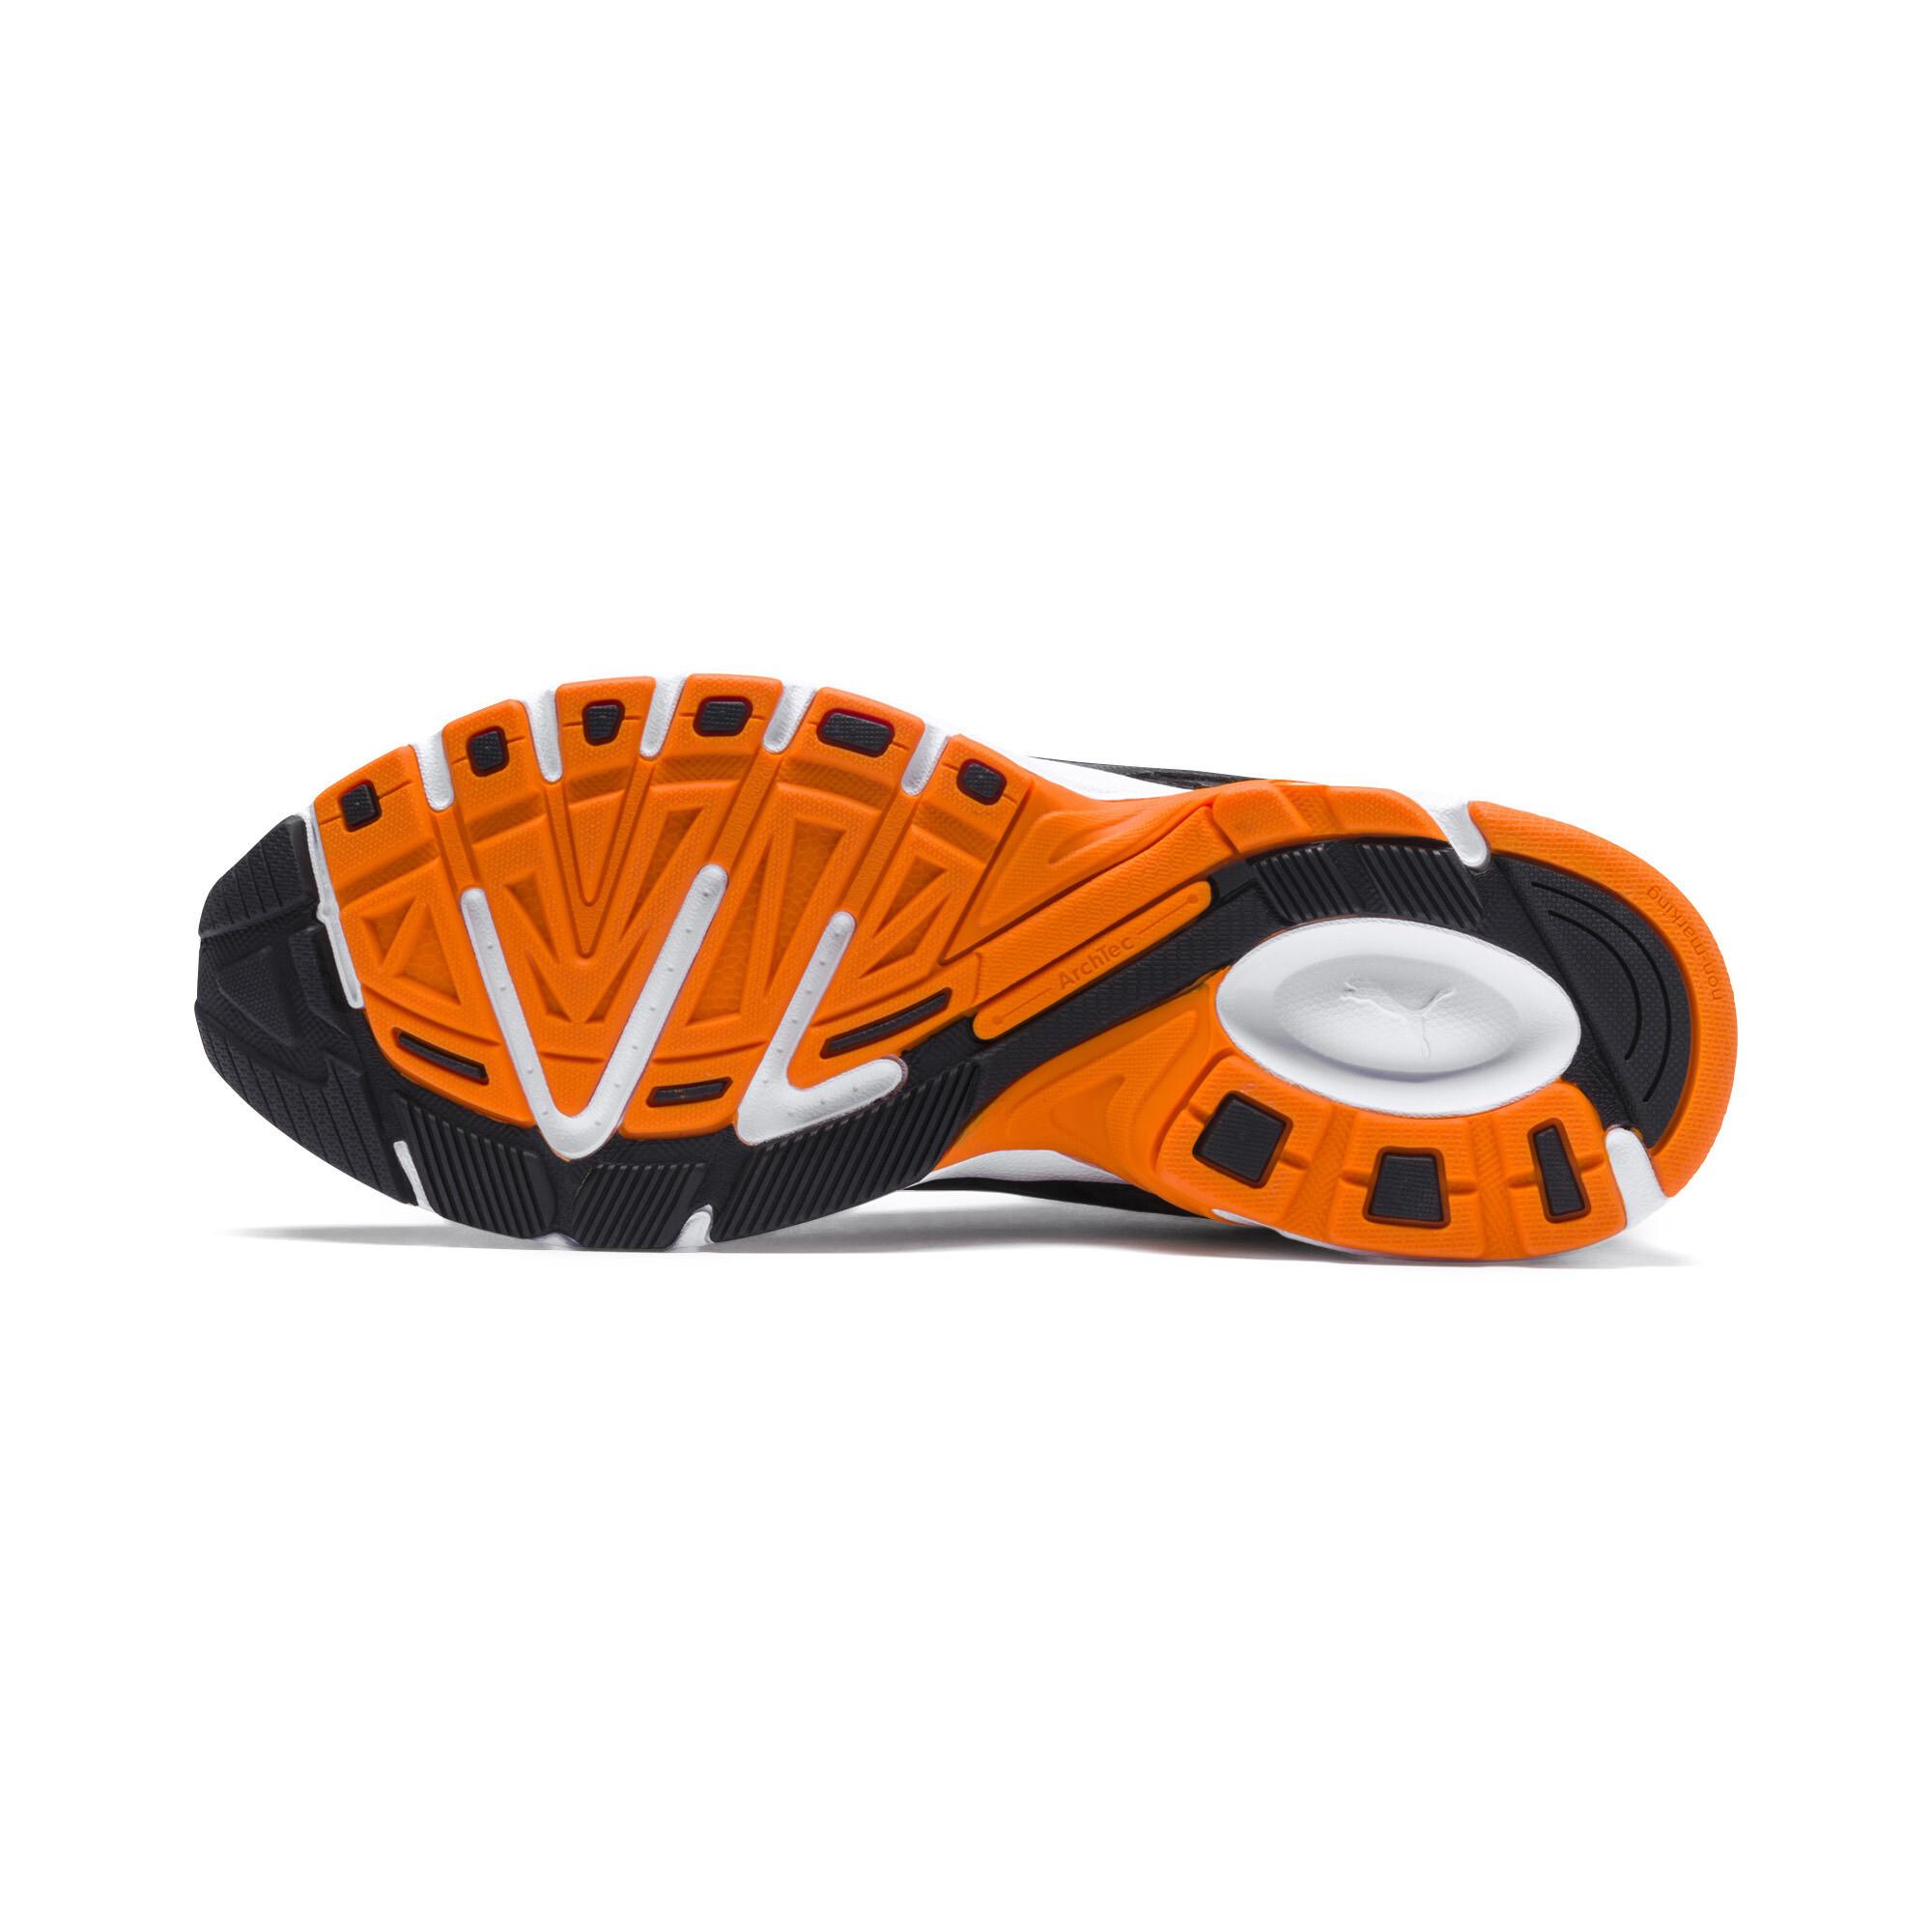 PUMA-Axis-Plus-90s-Sneakers-Men-Shoe-Basics thumbnail 5